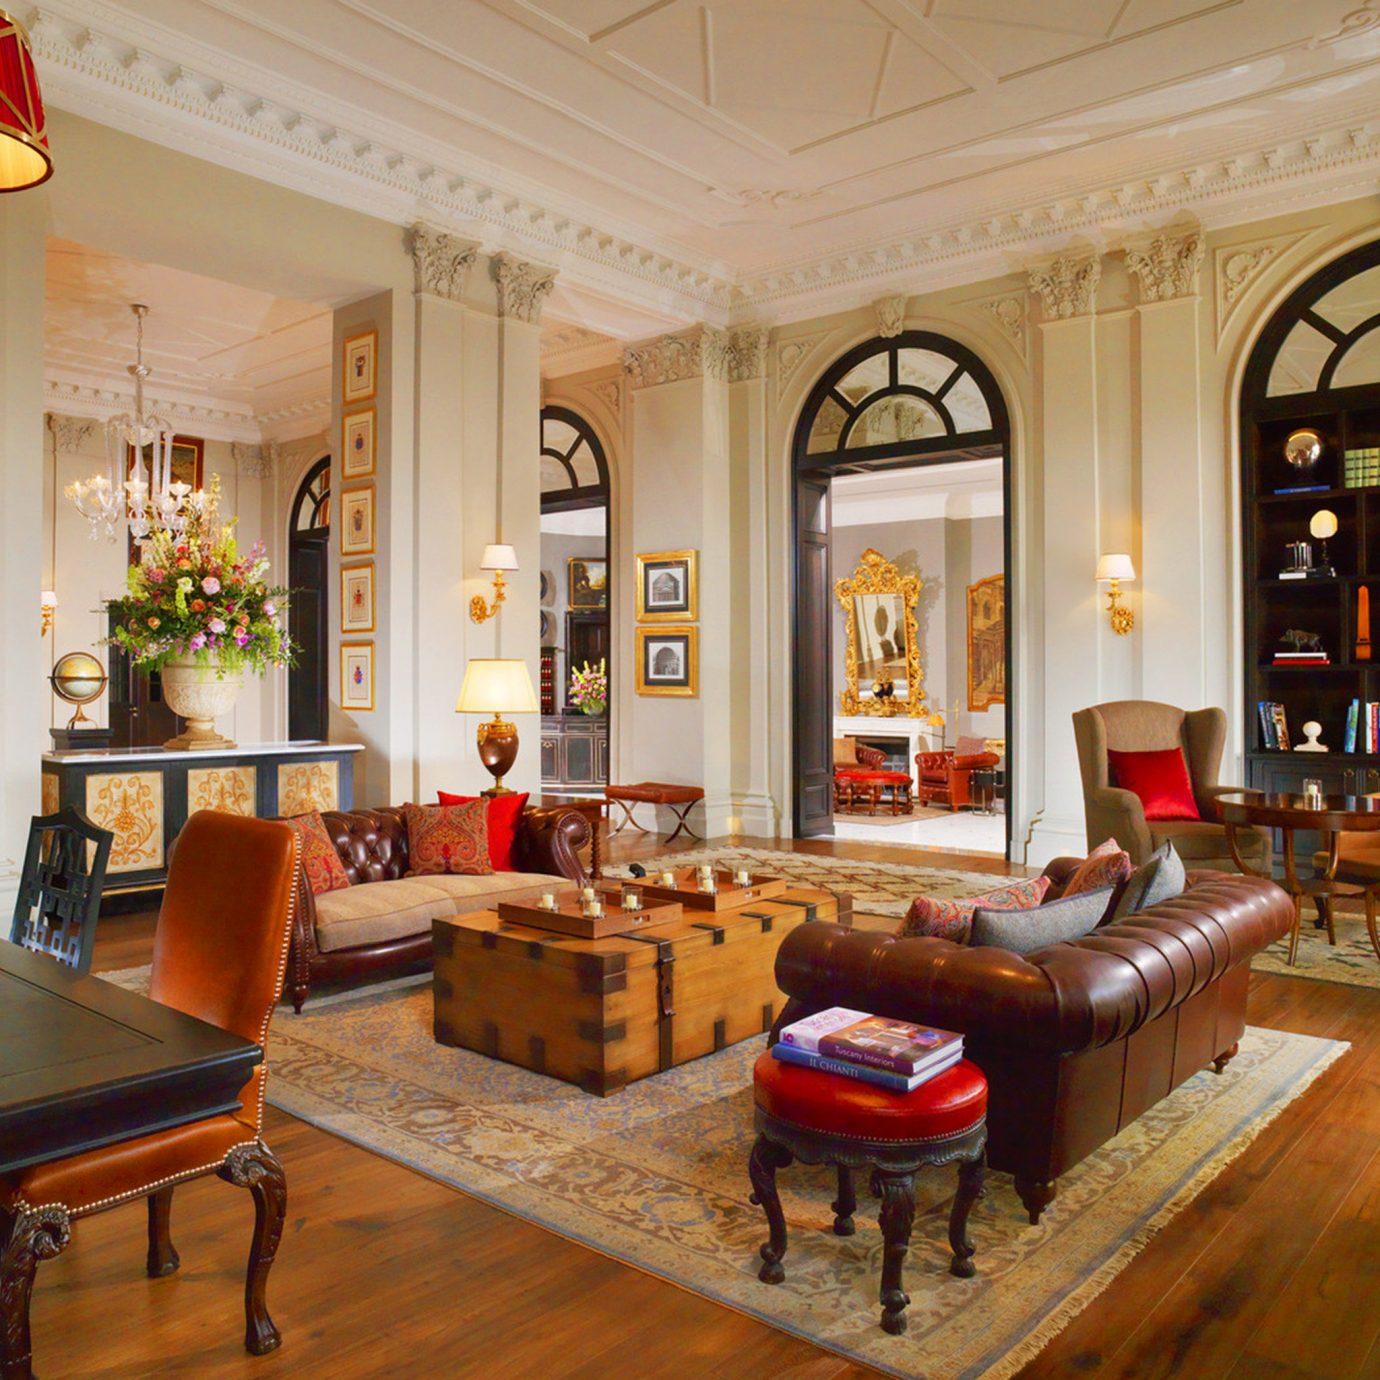 Elegant Historic Hotels Lounge Luxury Romance property living room home recreation room Lobby mansion